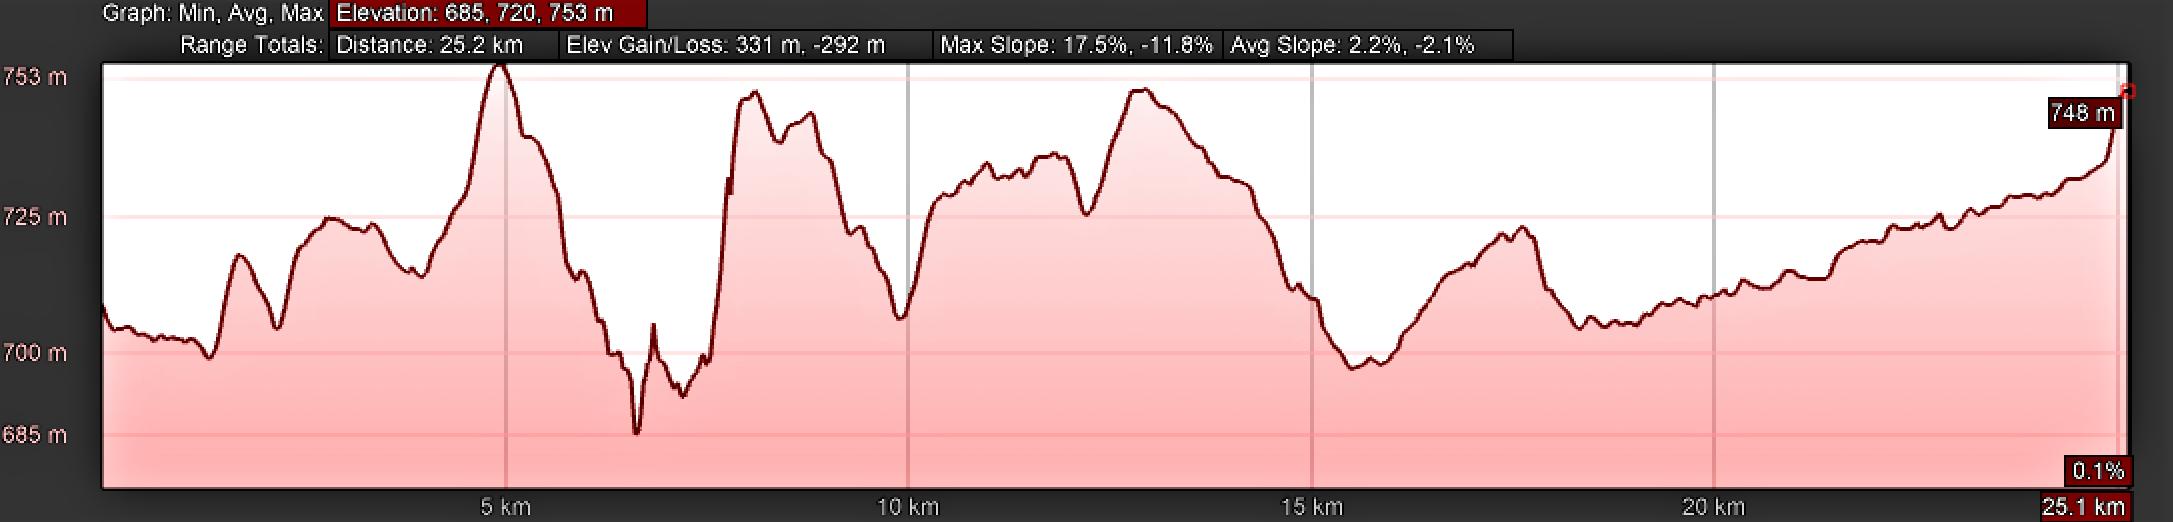 Elevation Profile, Camino Sanabrés from Granja de Moreruela to Tábara, Without Abbey